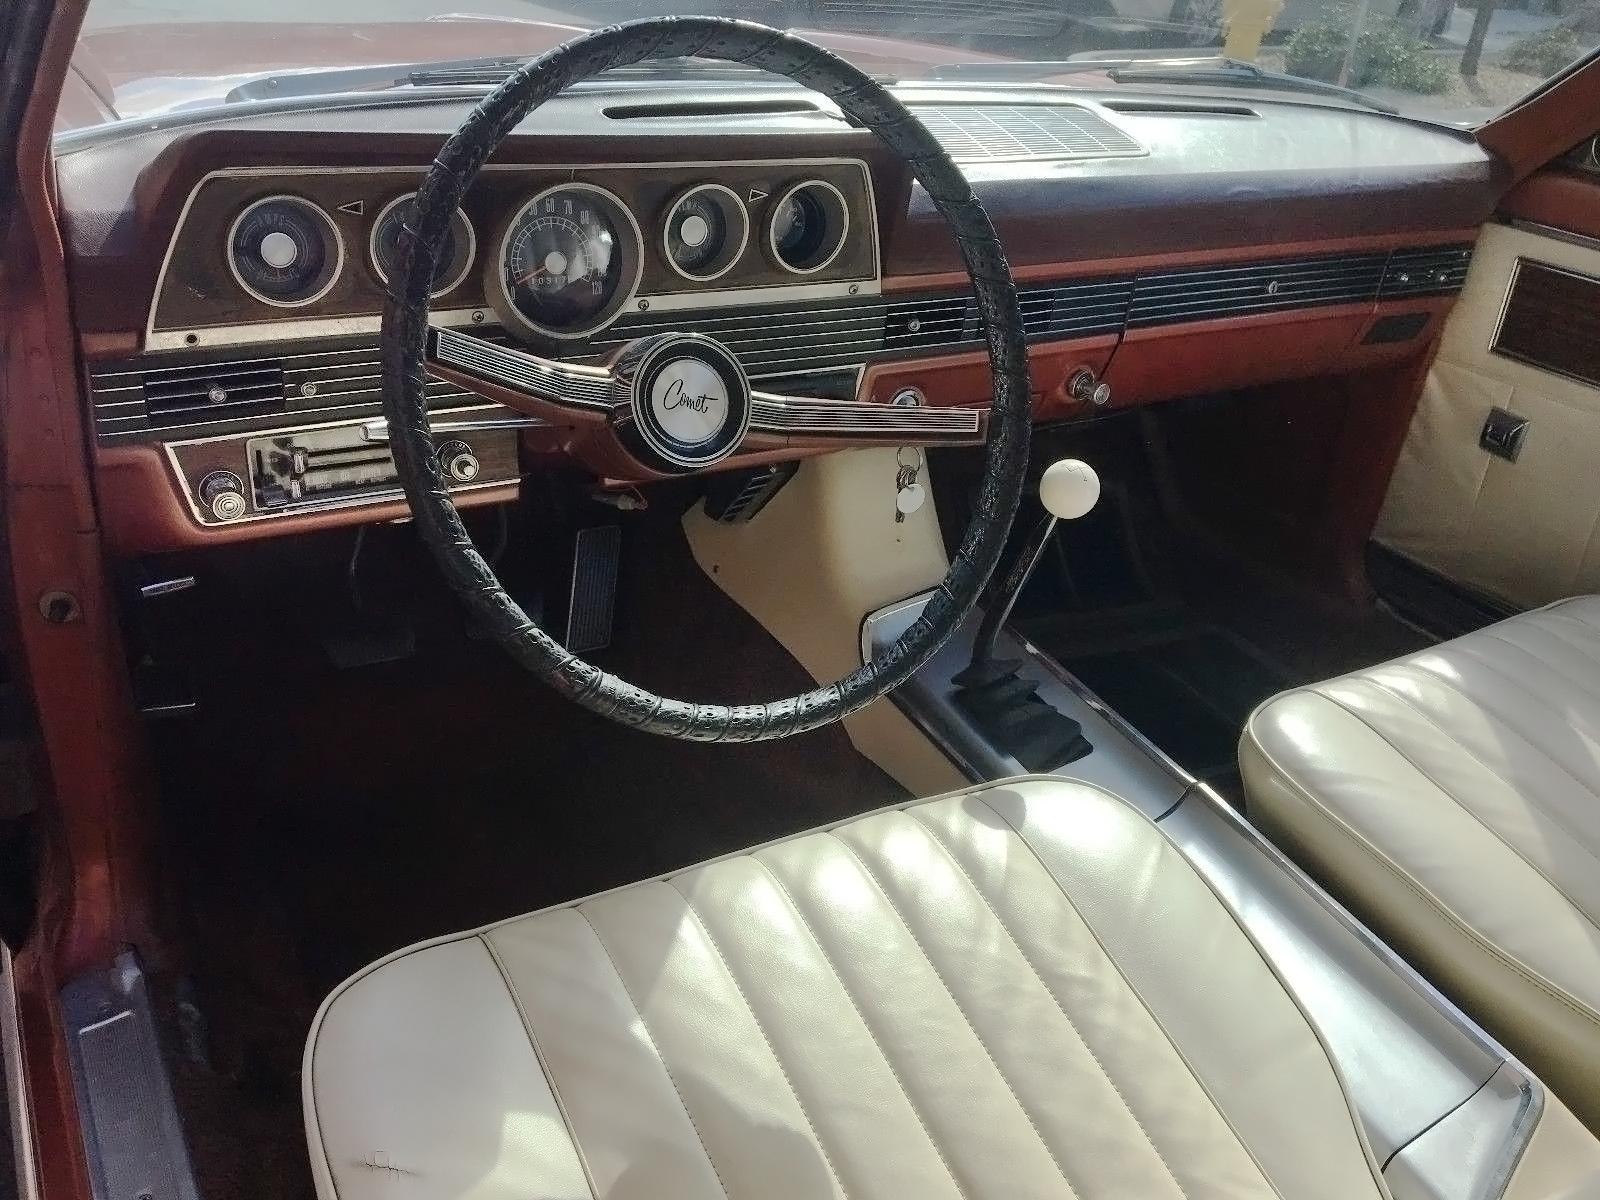 H-Code 390 V8 4-Speed! 1966 Mercury Comet Caliente  H-Code 390 V8 4...